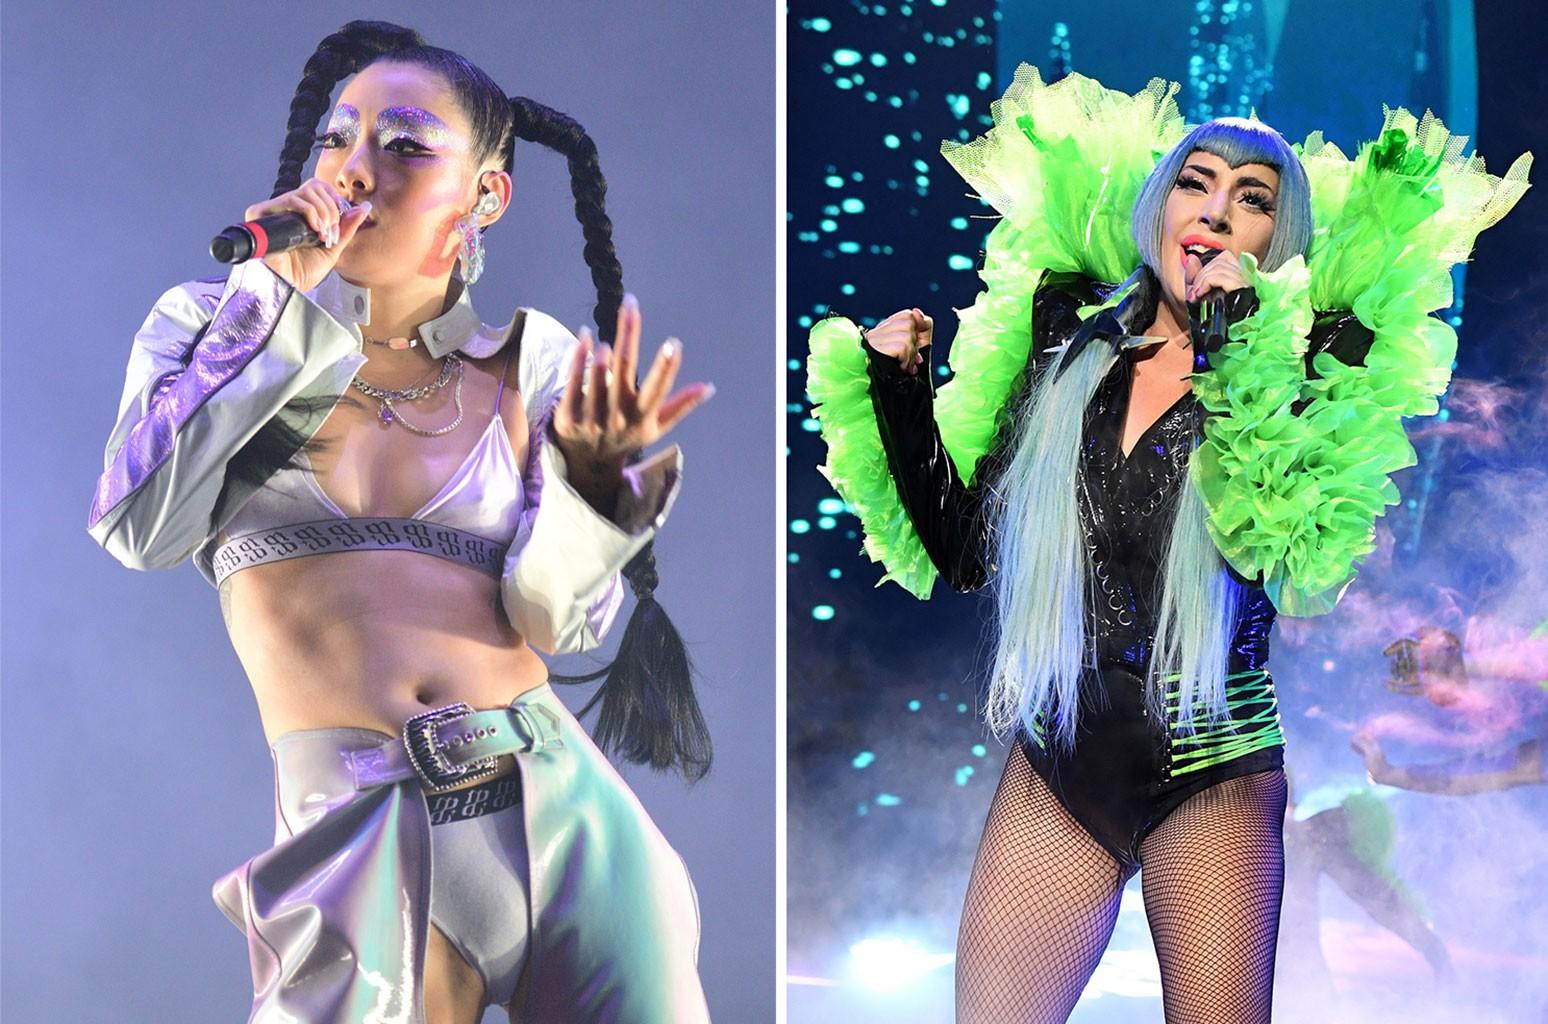 Rina Sawayama and Lady Gaga